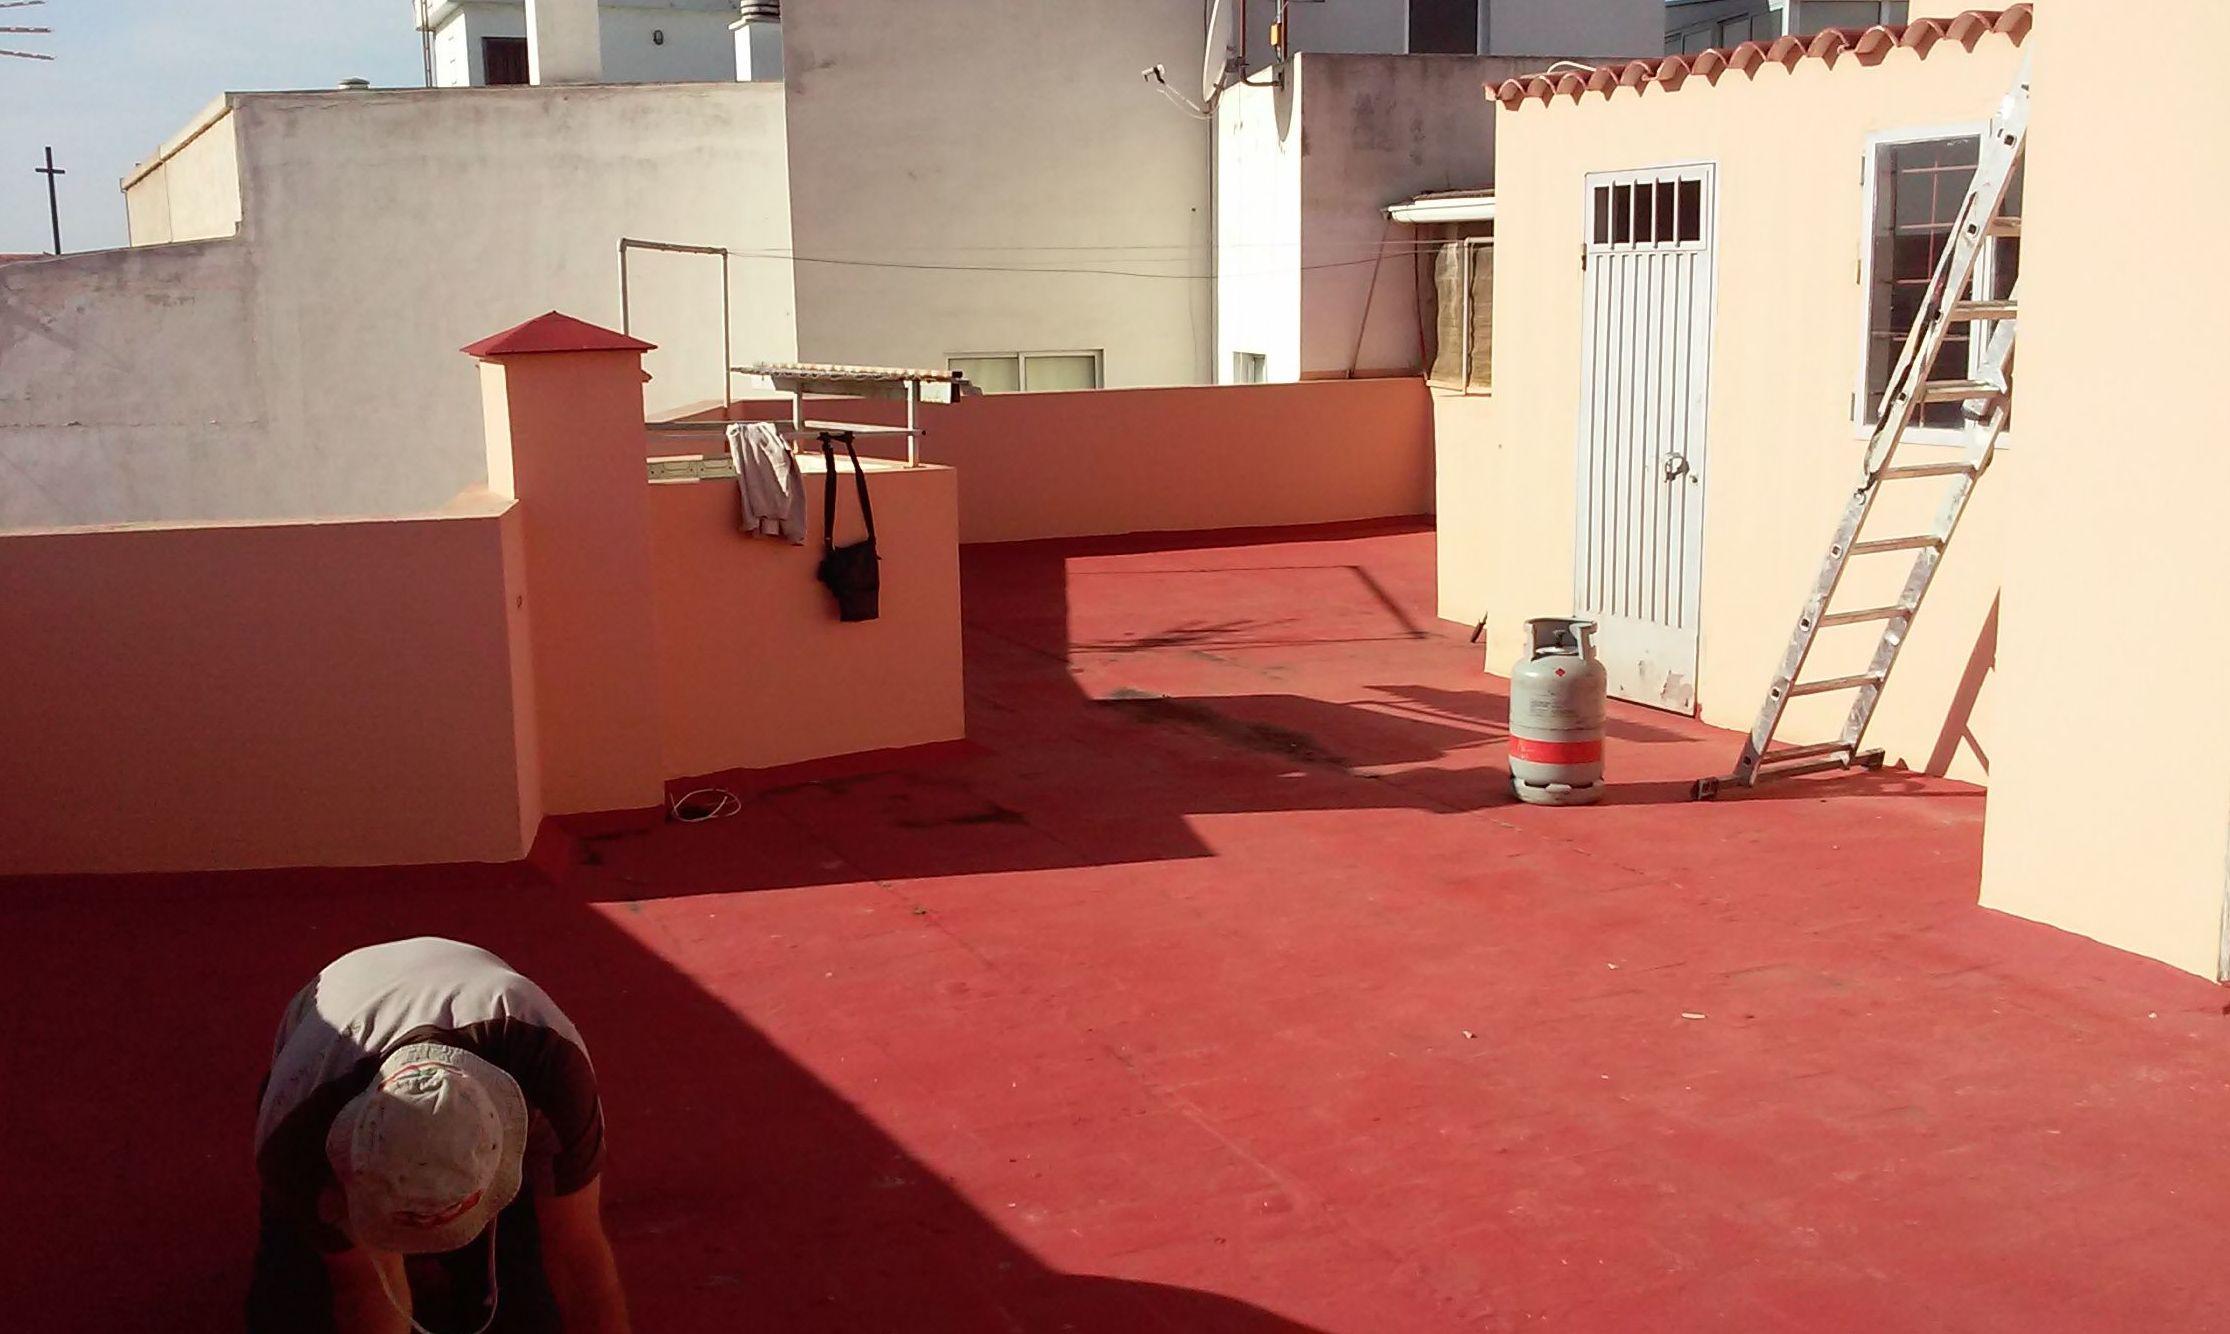 Foto 107 de Impermeabilizaciones en Santa Cruz de Tenerife | Ingarpe